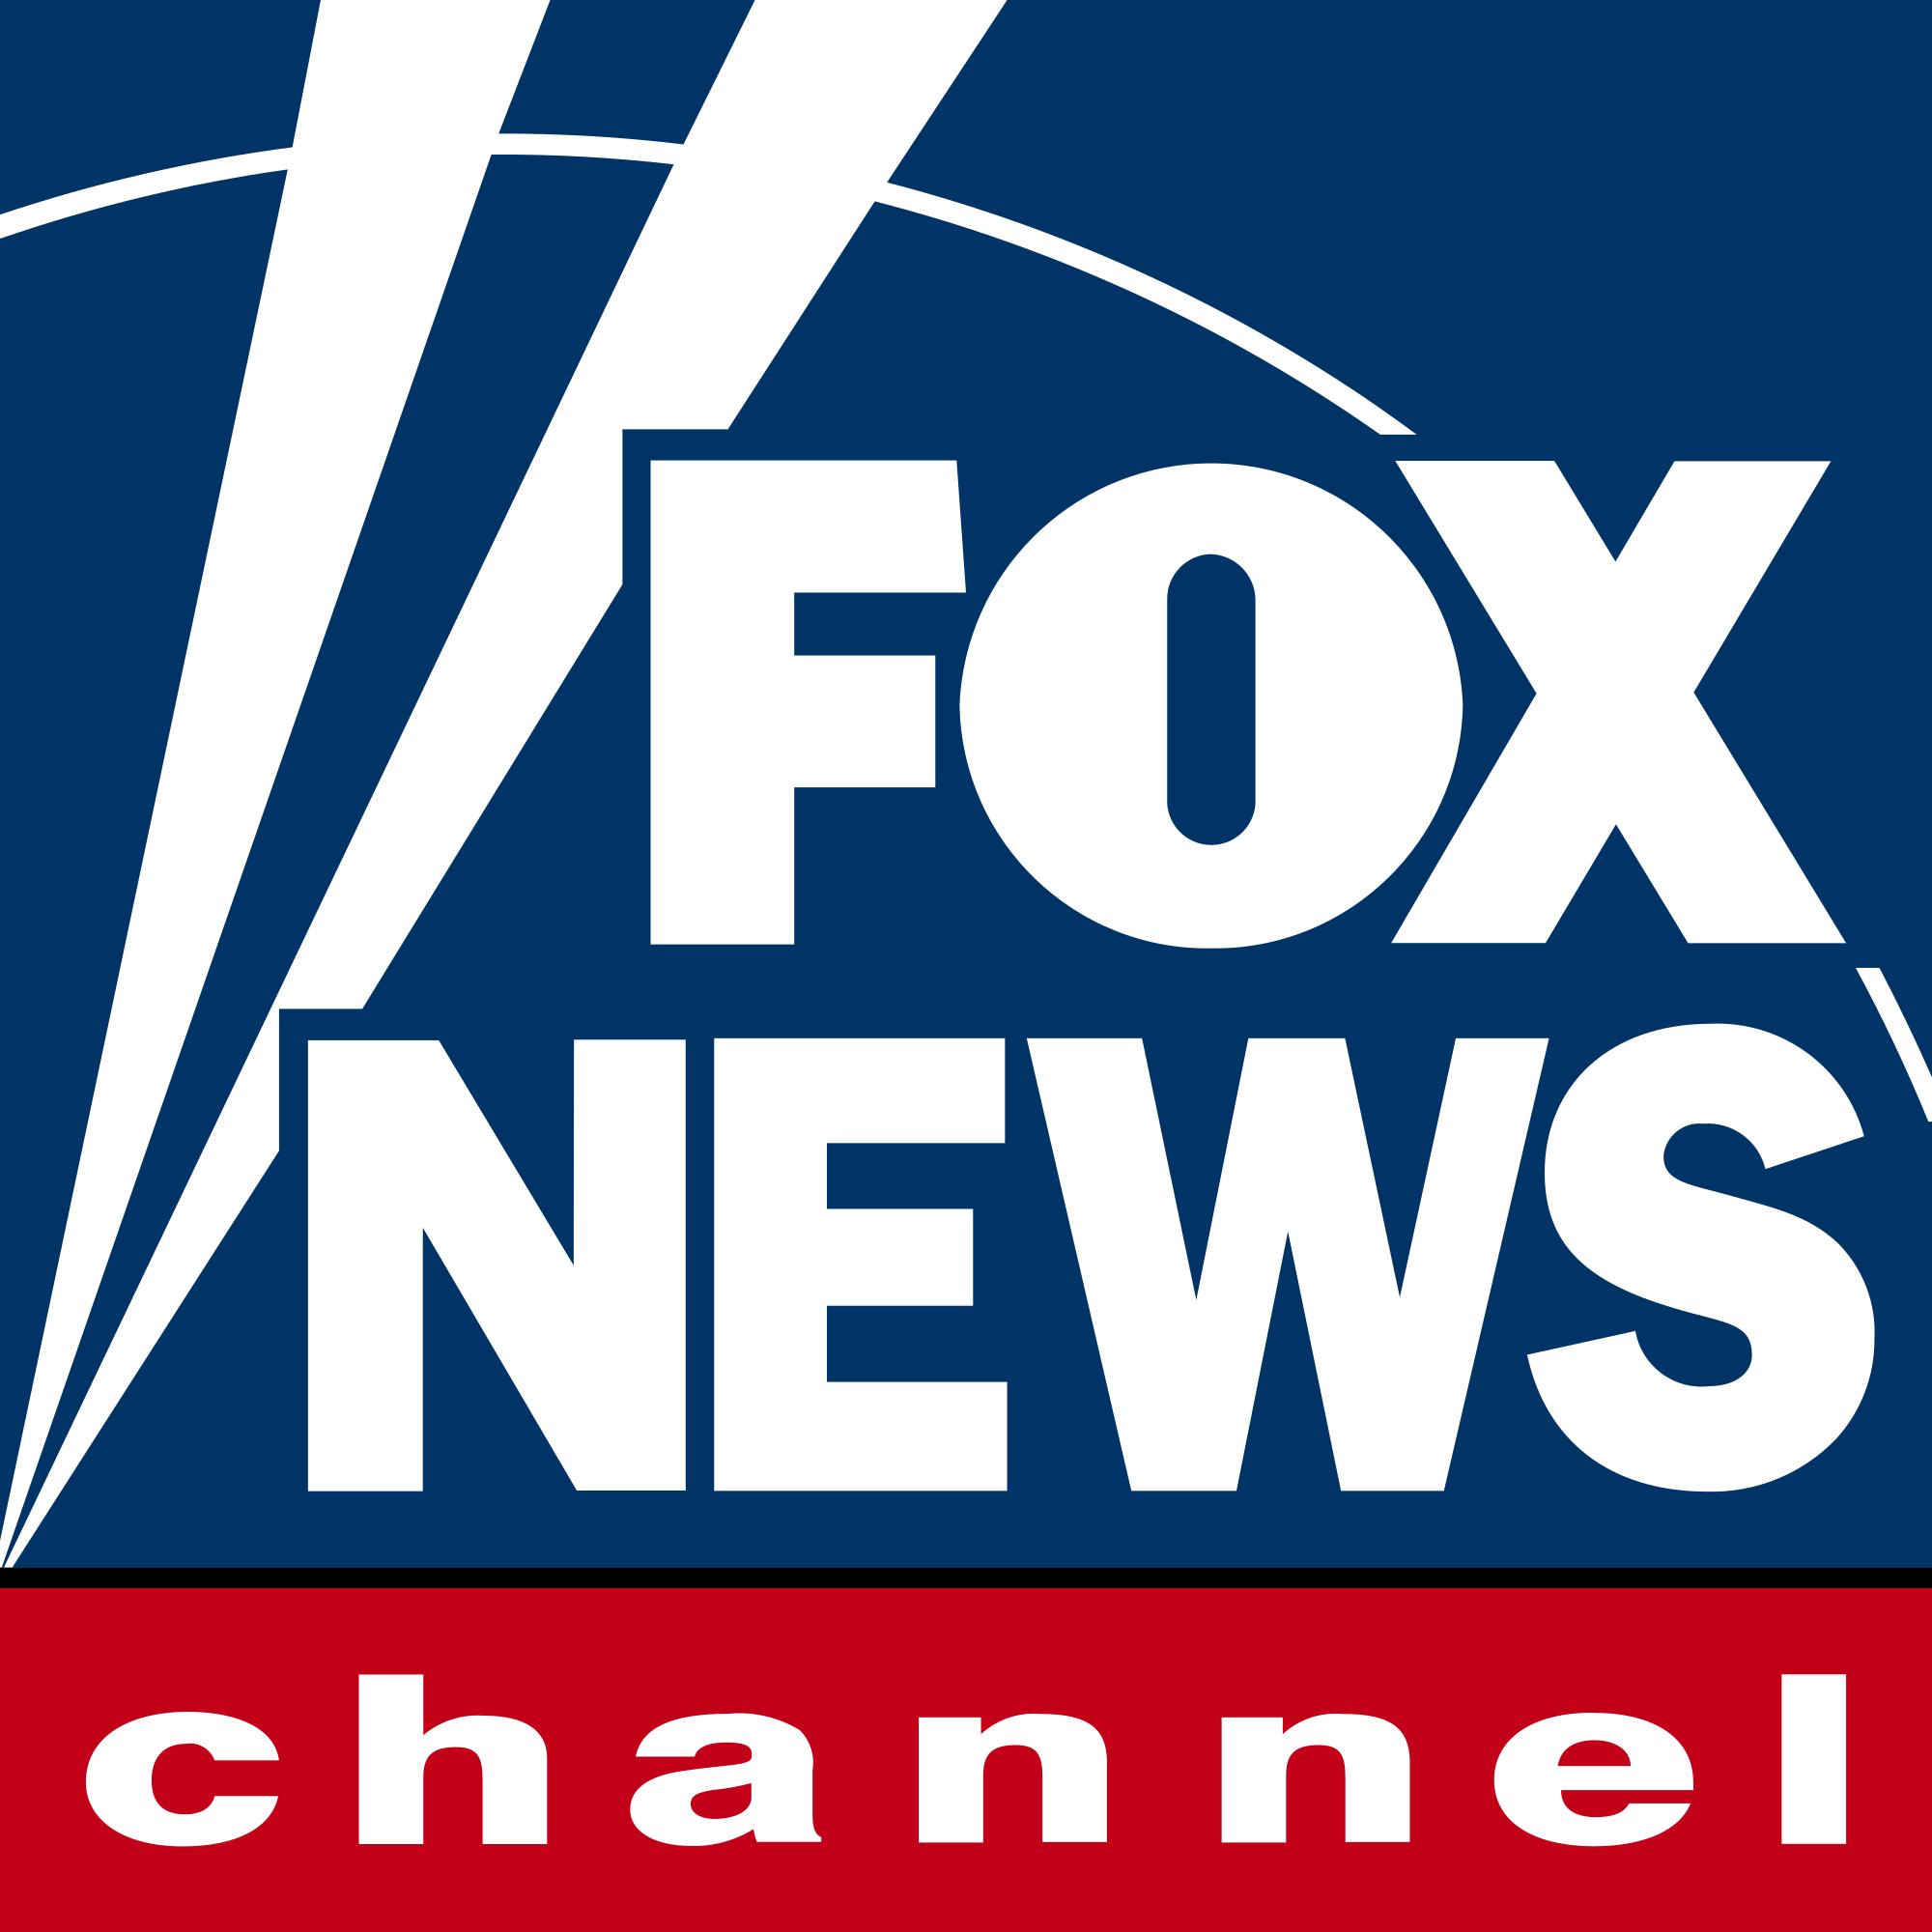 Fox news channel logo clipart banner royalty free Fox News Channel Logo - LogoDix banner royalty free